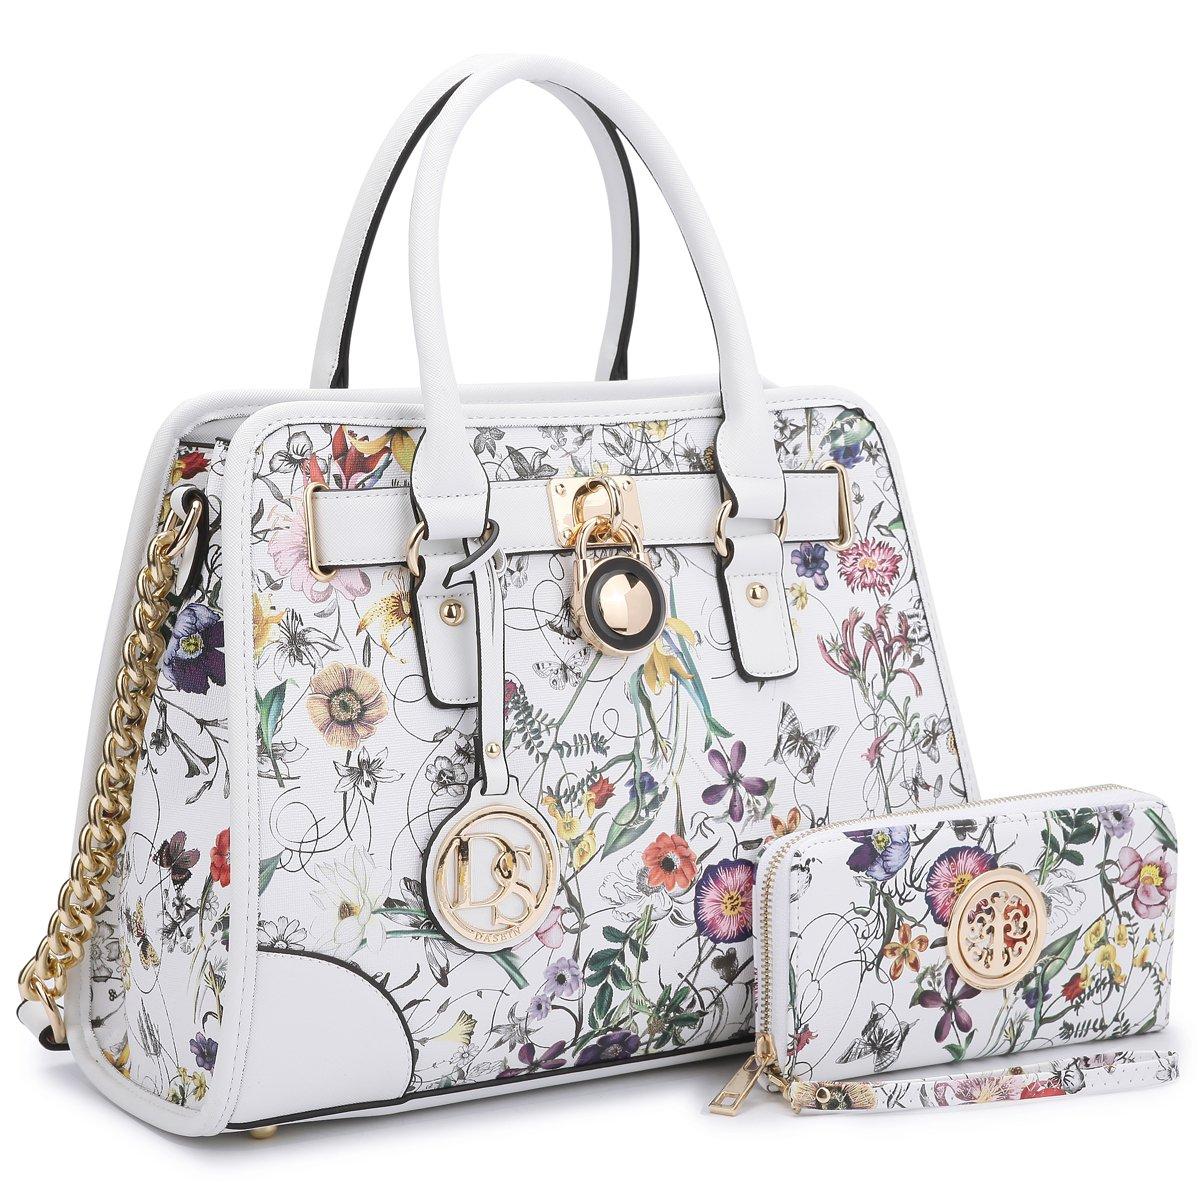 Dasein Women's Designer Padlock Striped Belted Top Handle Satchel Handbag Purse Shoulder Bag With Wallet (White Floral Style)